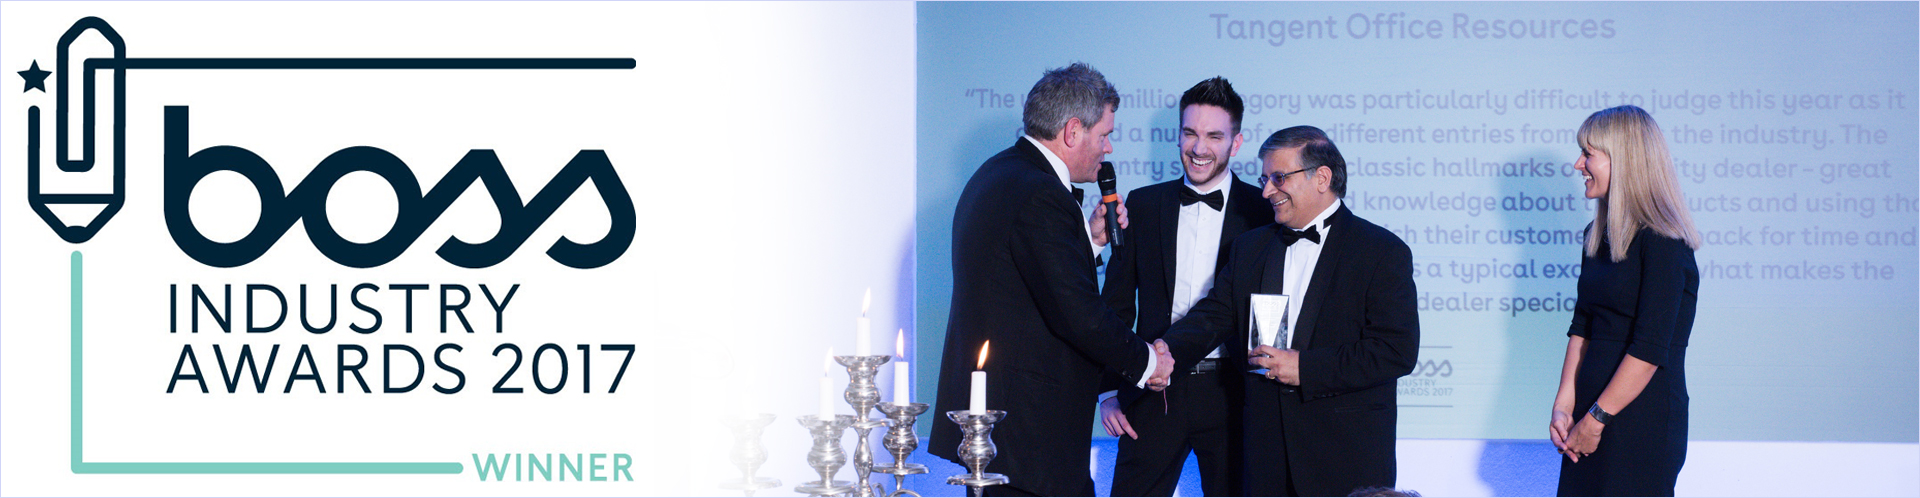 Tangent Award